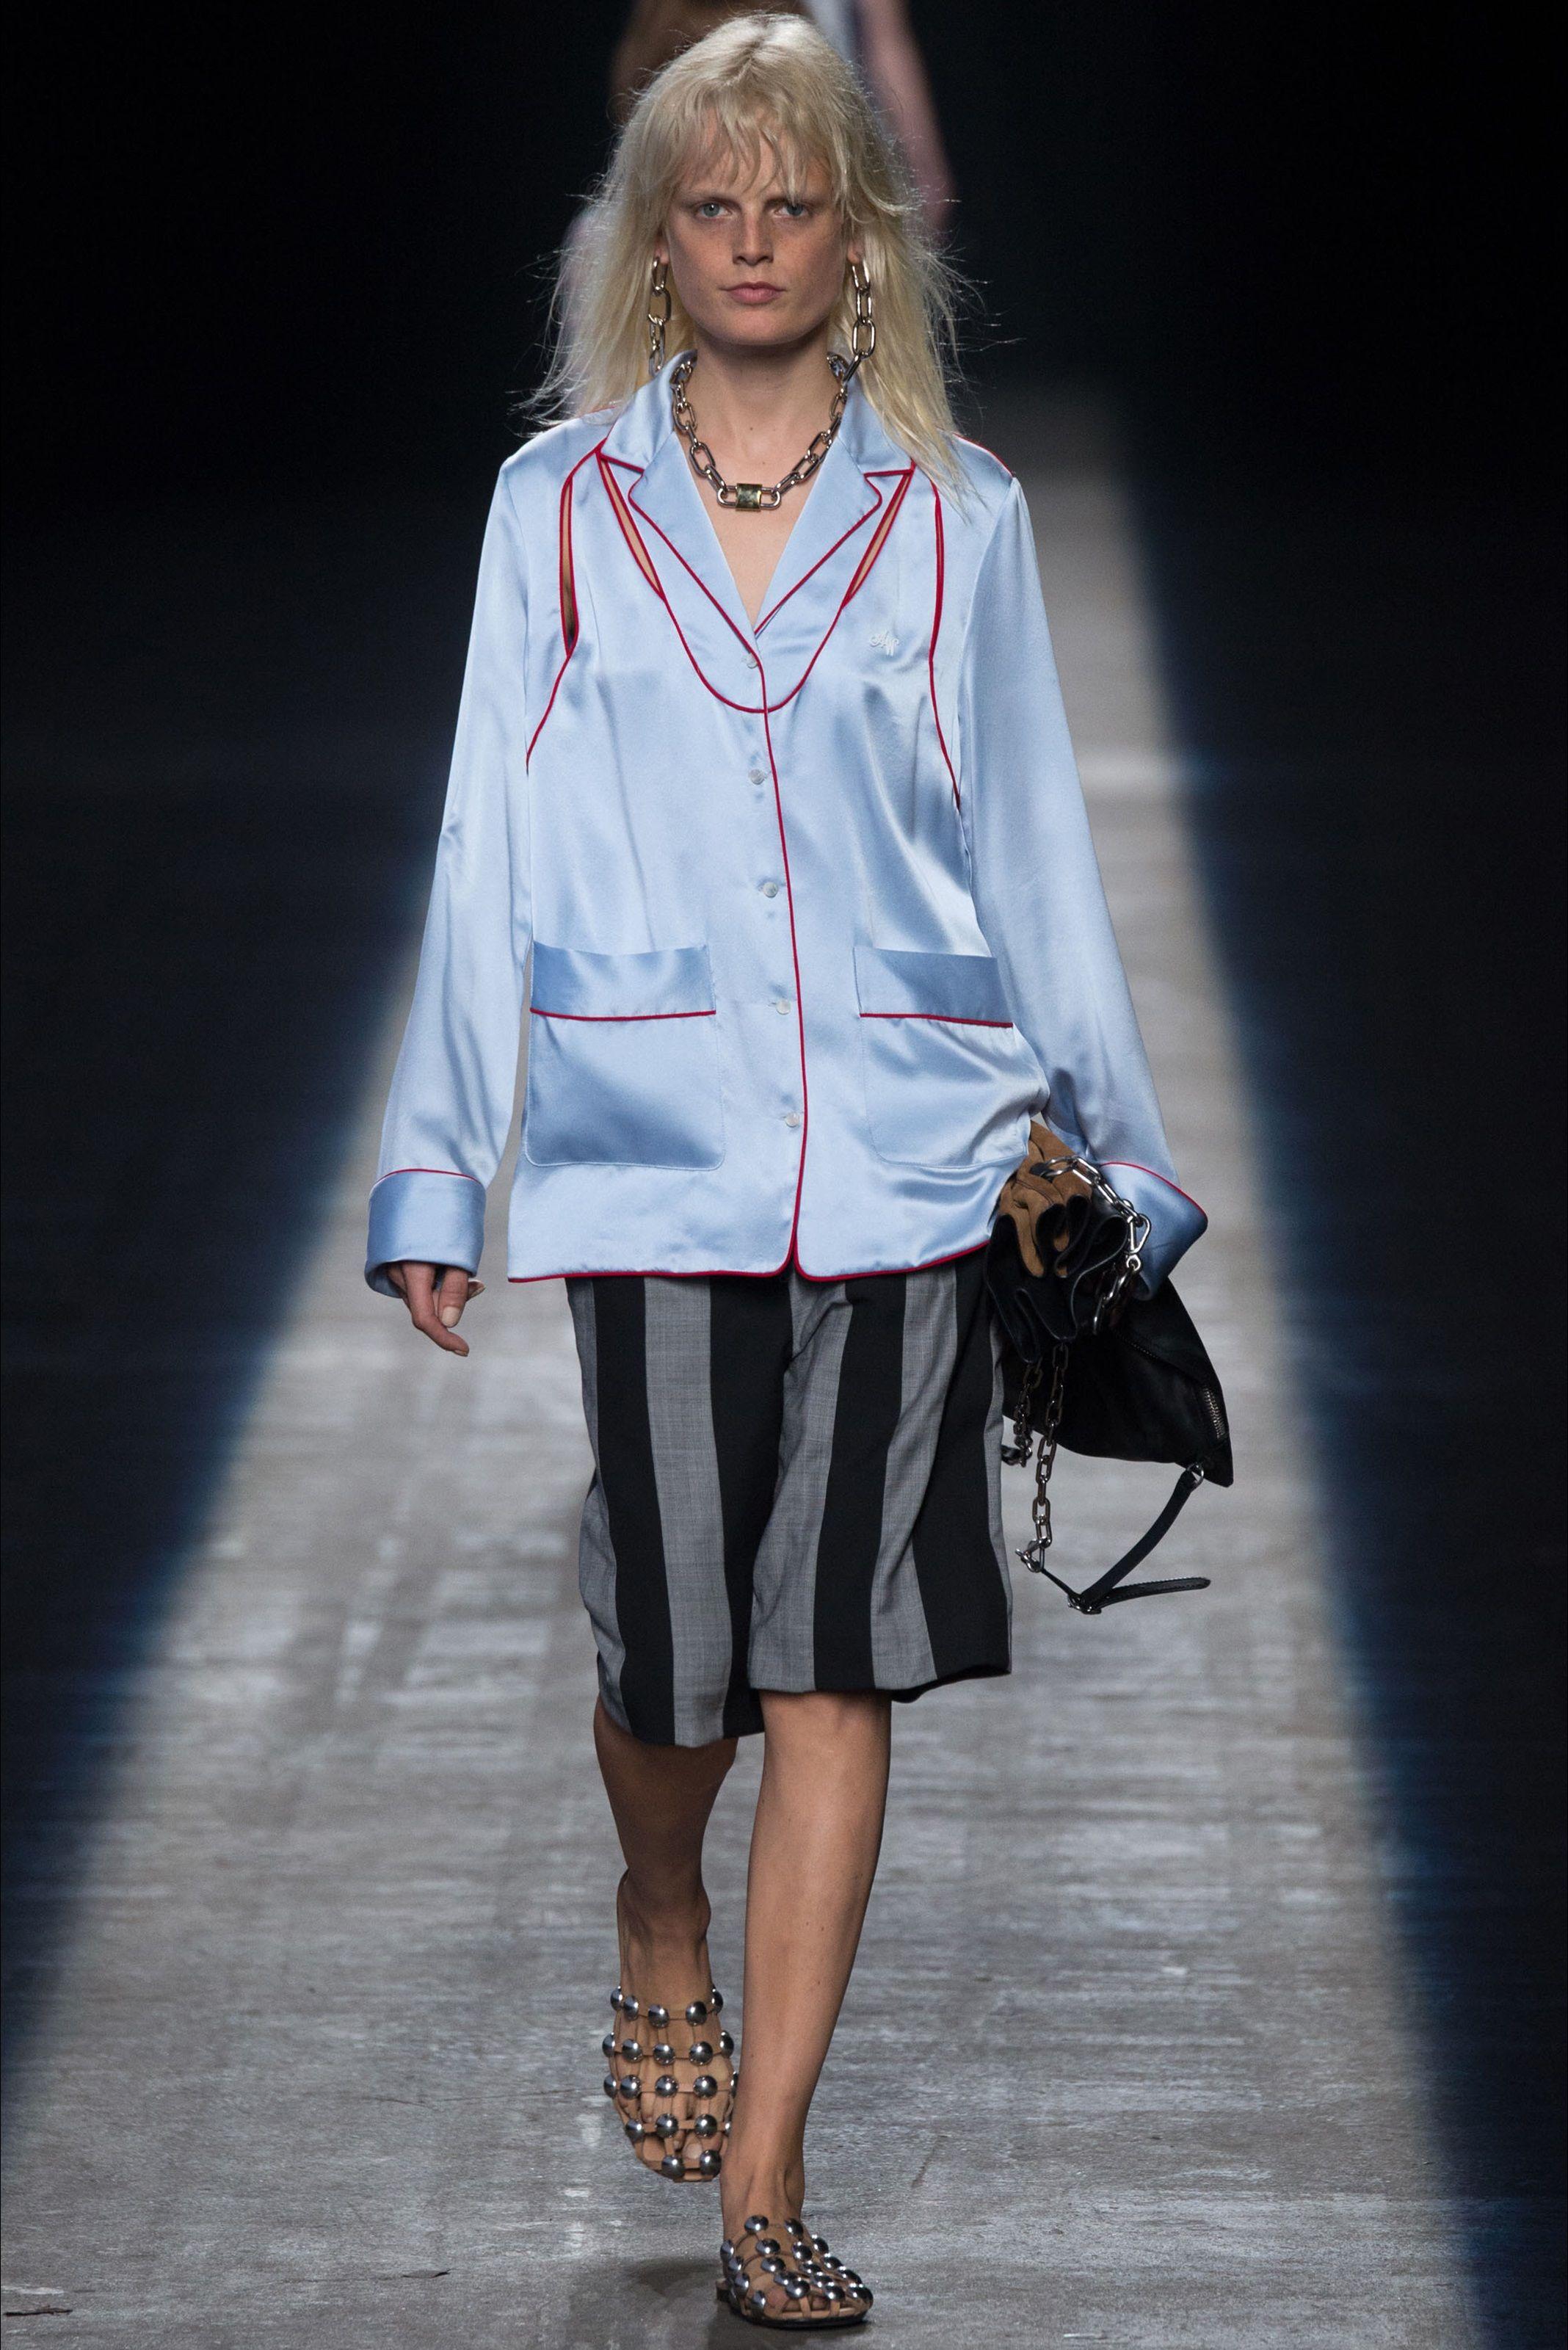 Sfilata Alexander Wang New York - Collezioni Primavera Estate 2016 - Vogue